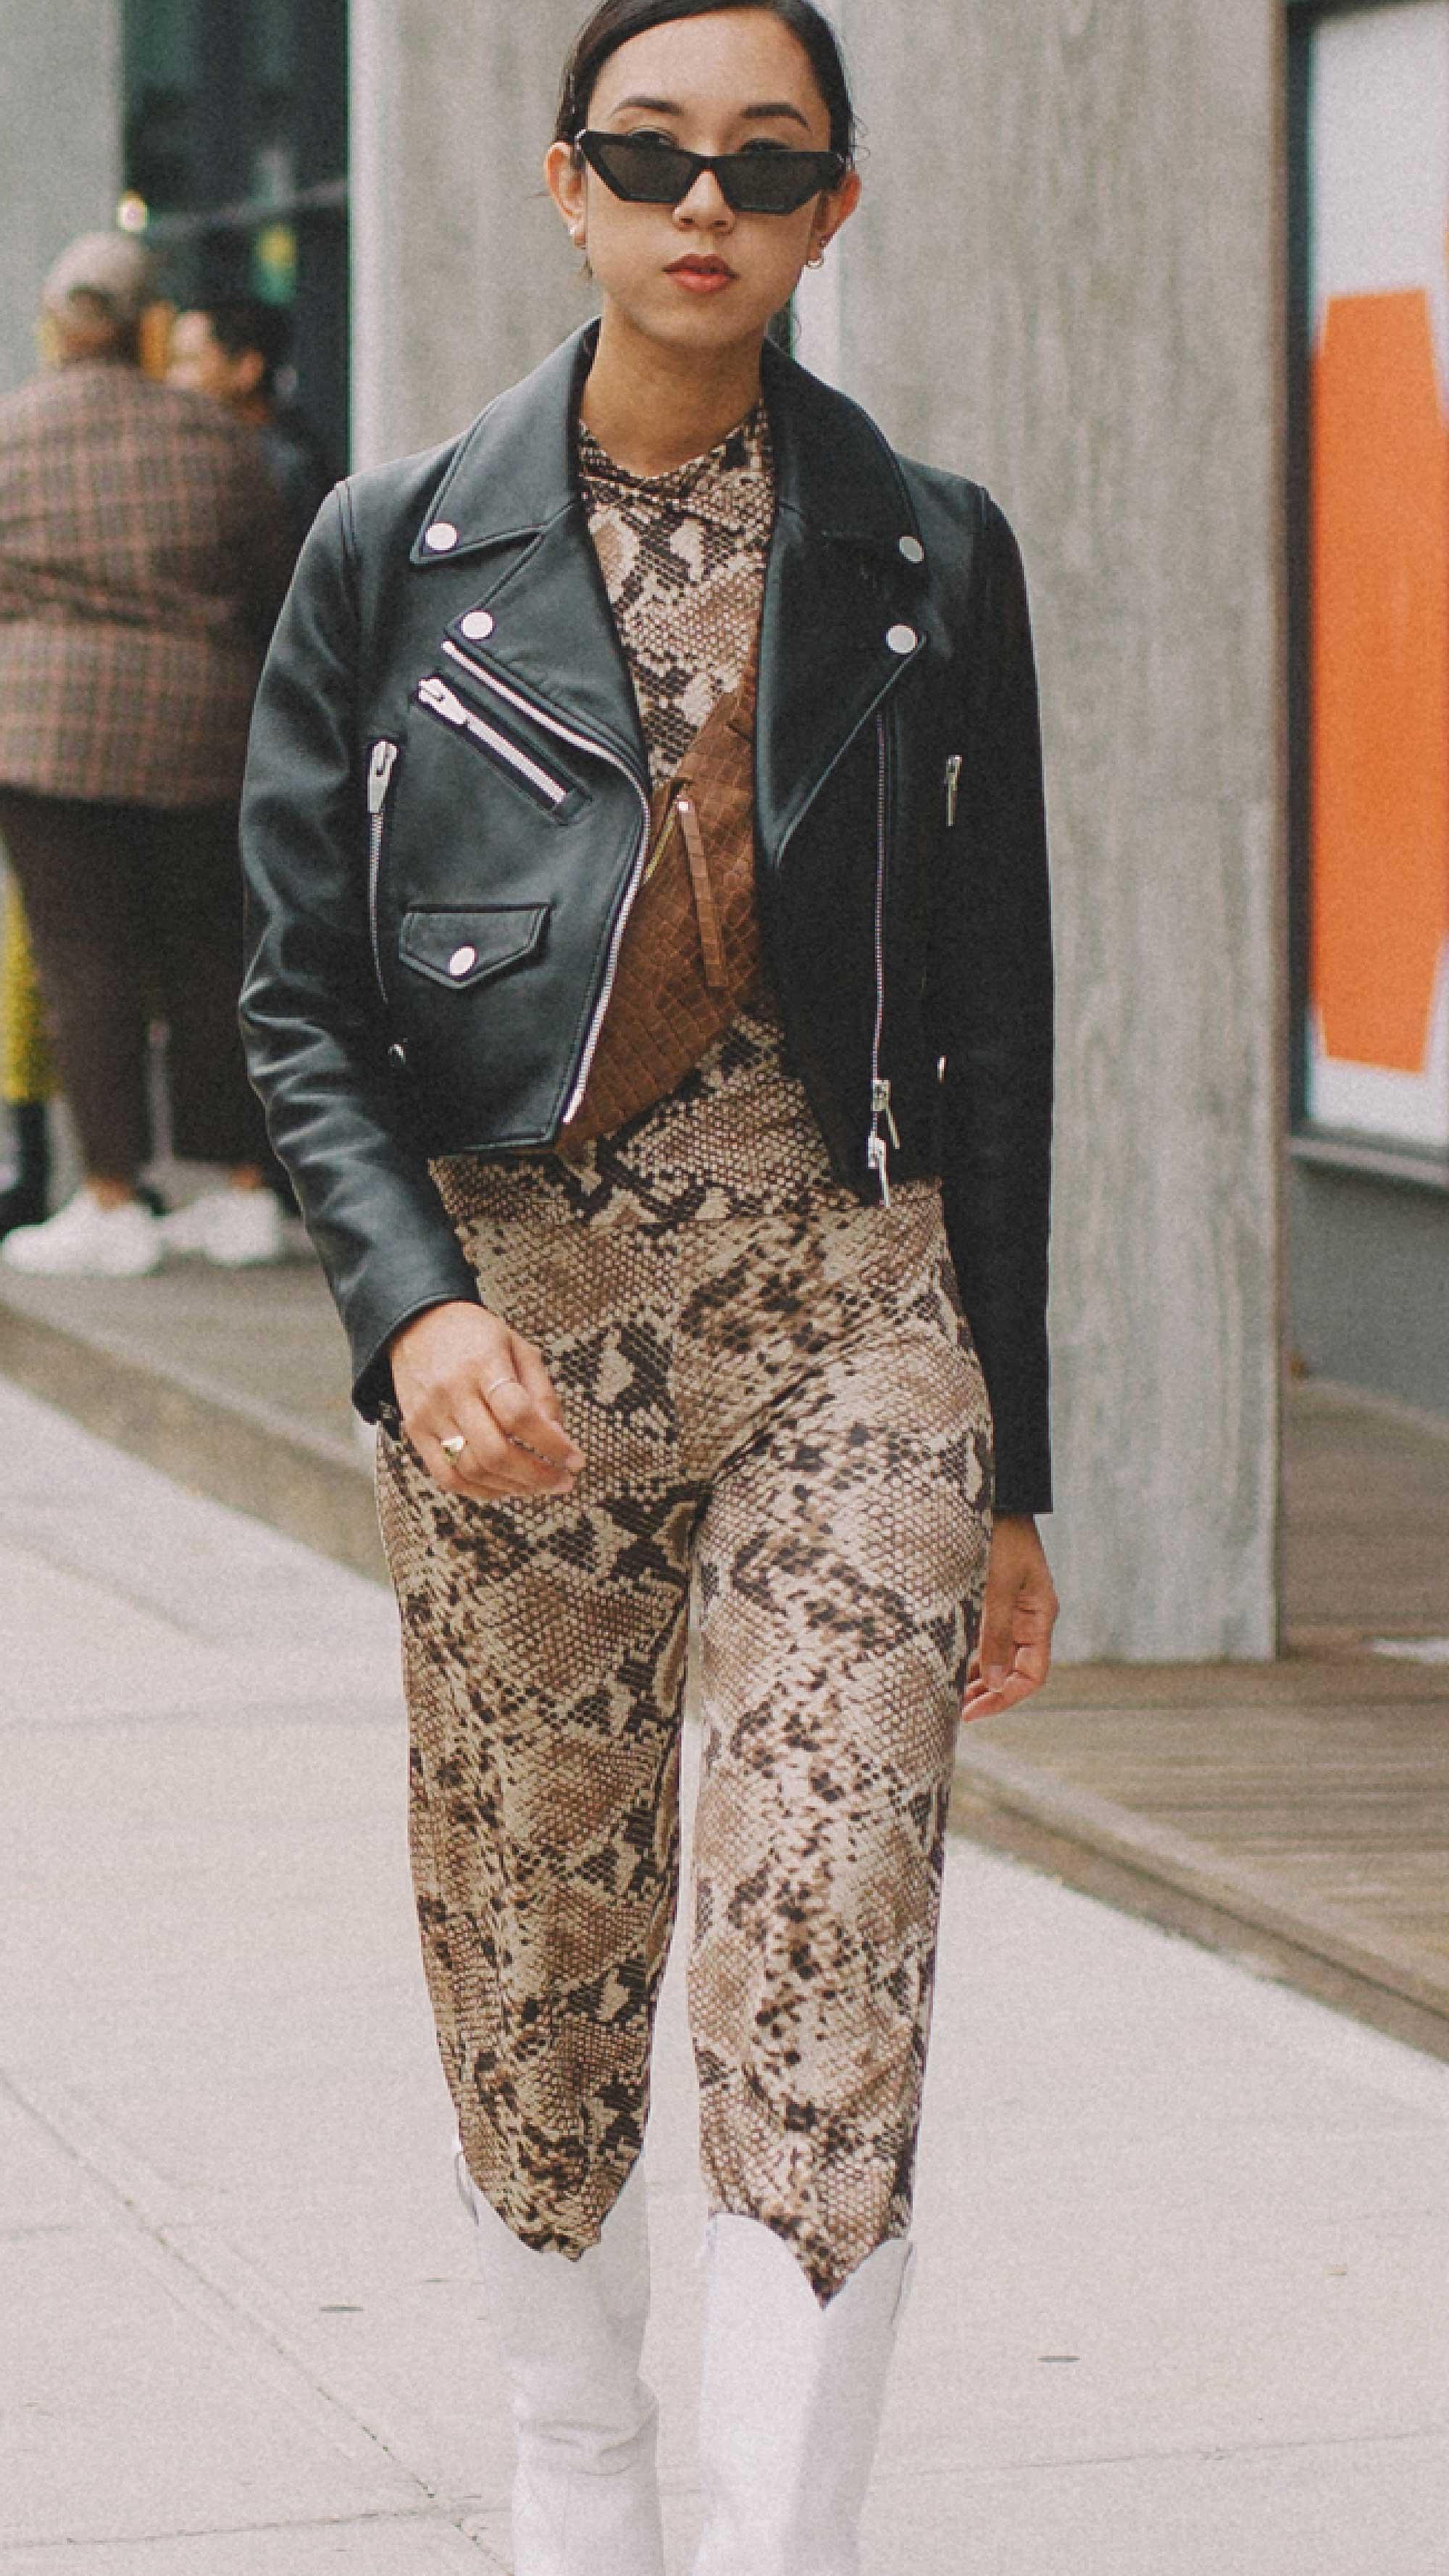 New-York-Fashion-Week-NYFW-SS18-street-style-day-three-SS1816.jpg